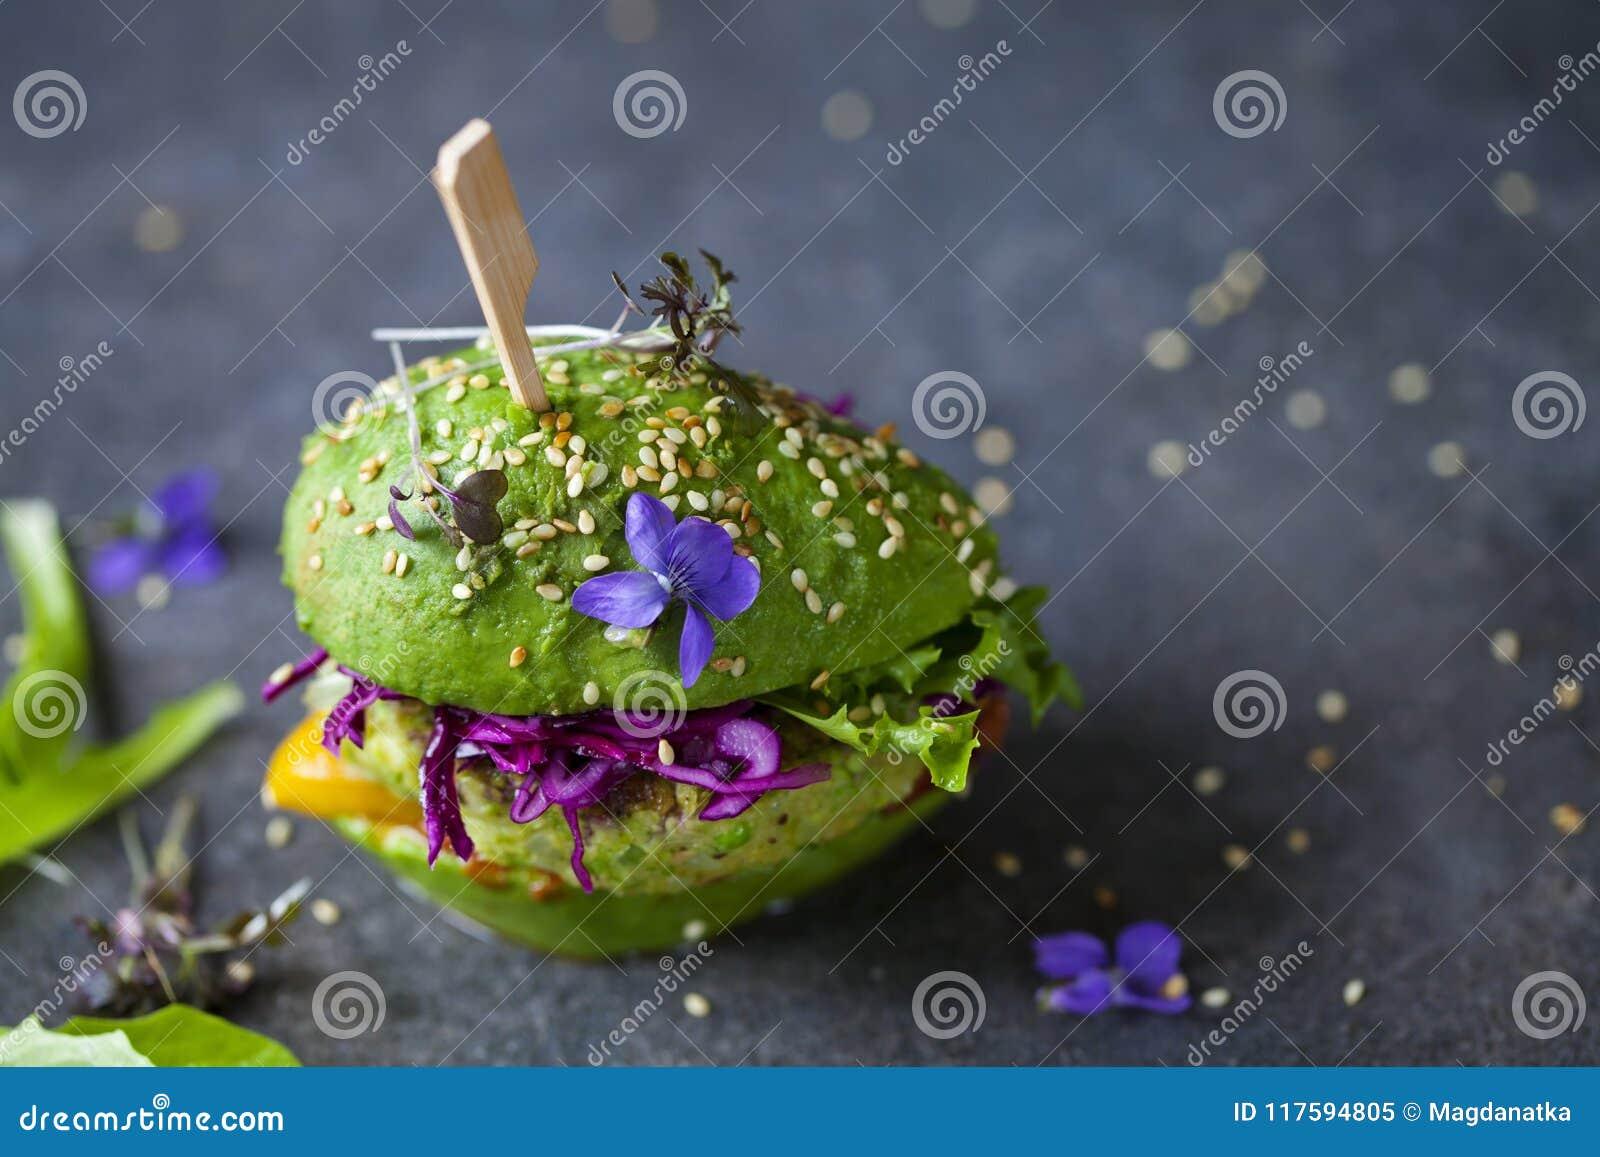 Avocado burger with green patty